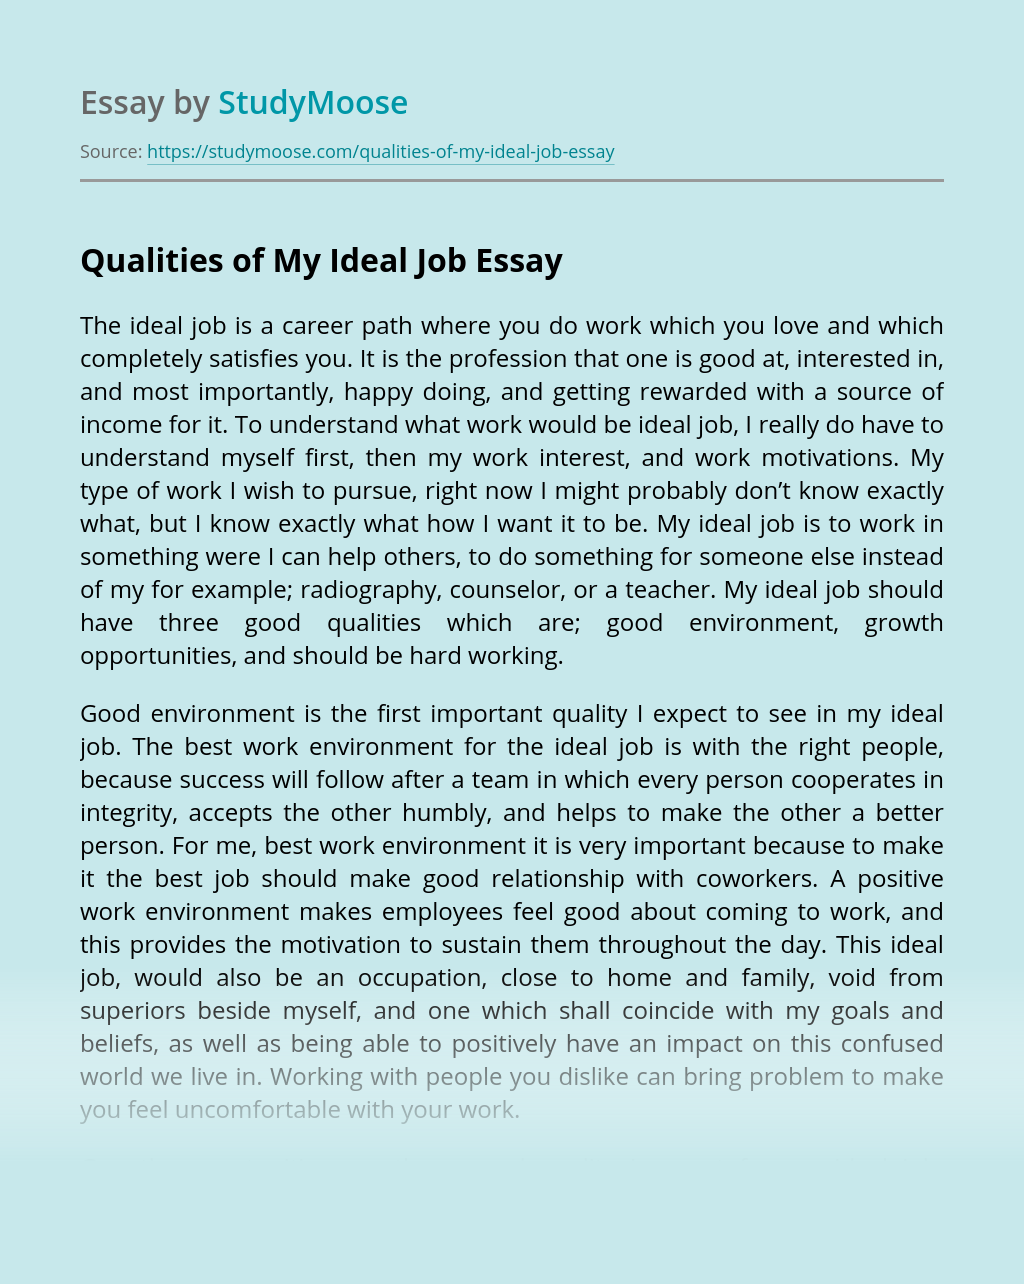 Qualities of My Ideal Job